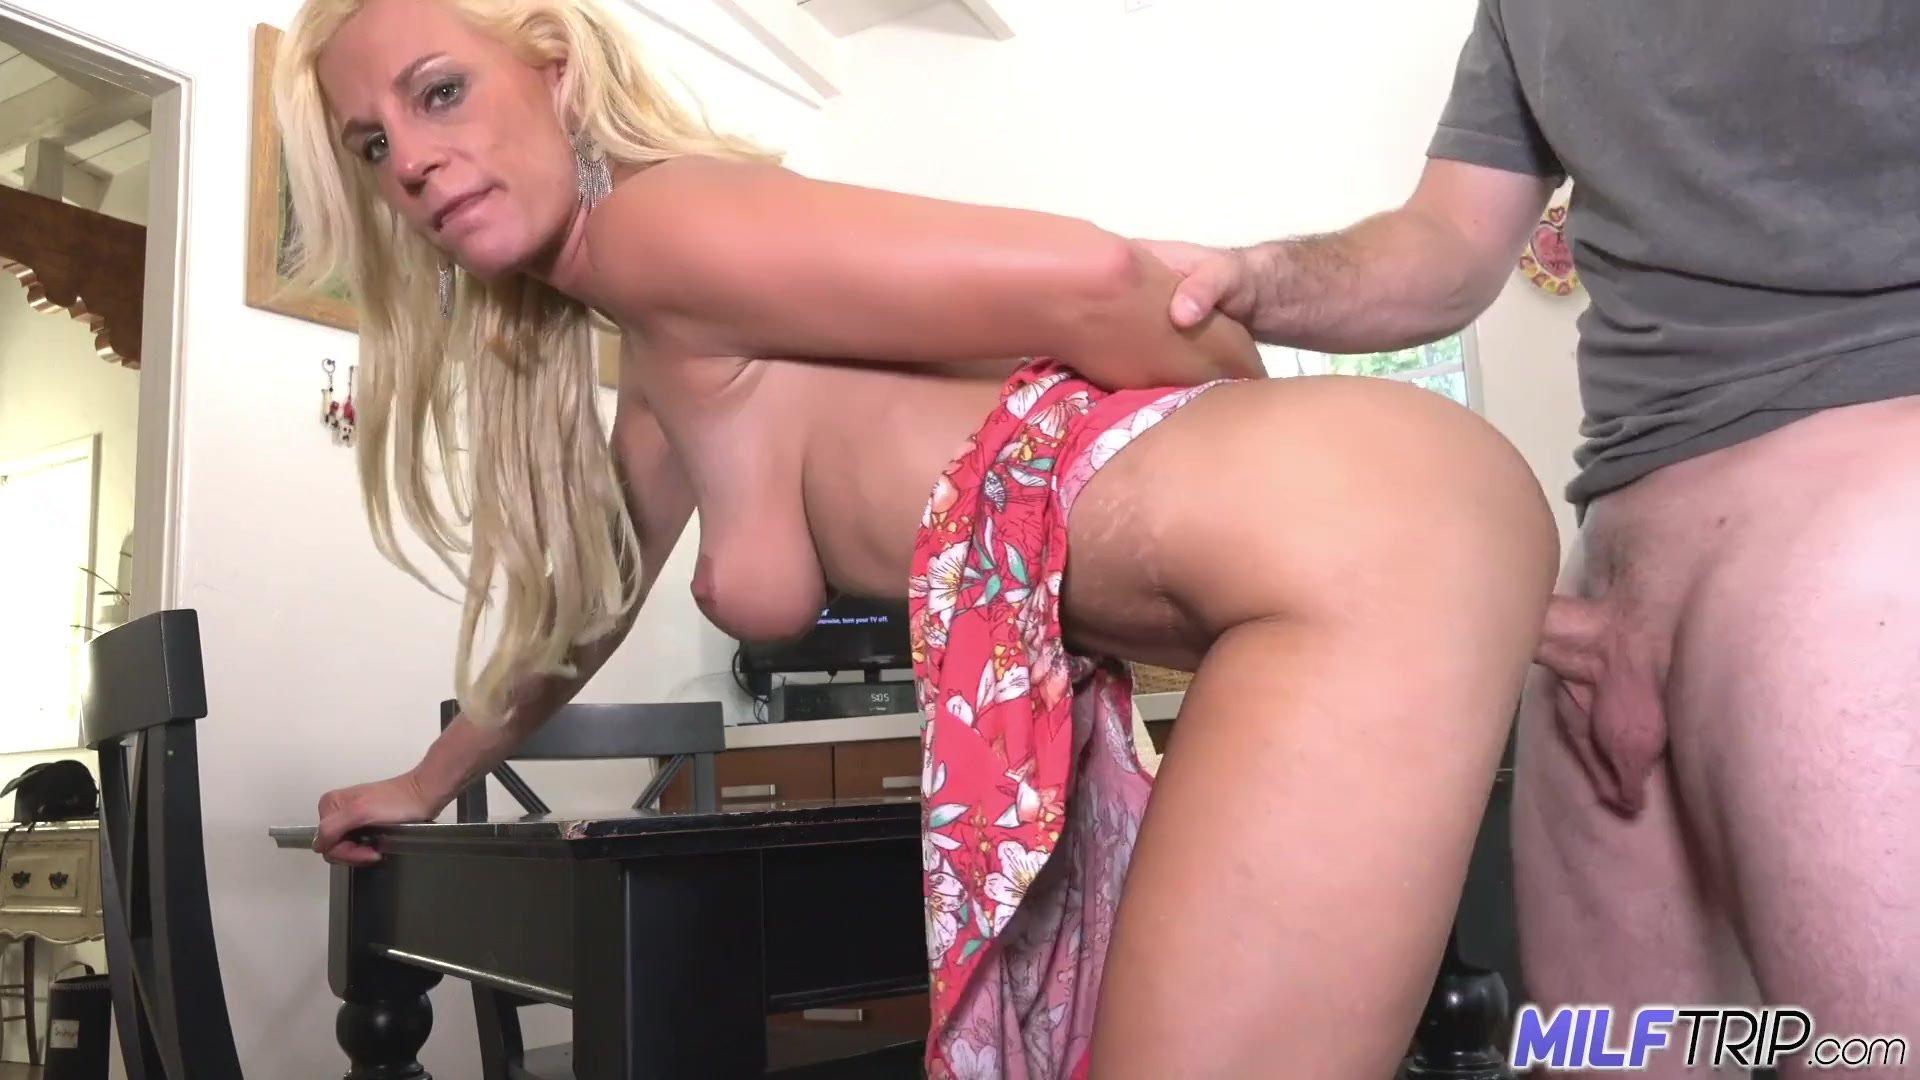 MILF Trip - Big boobed blonde MILF gets fat white dick - Part 1